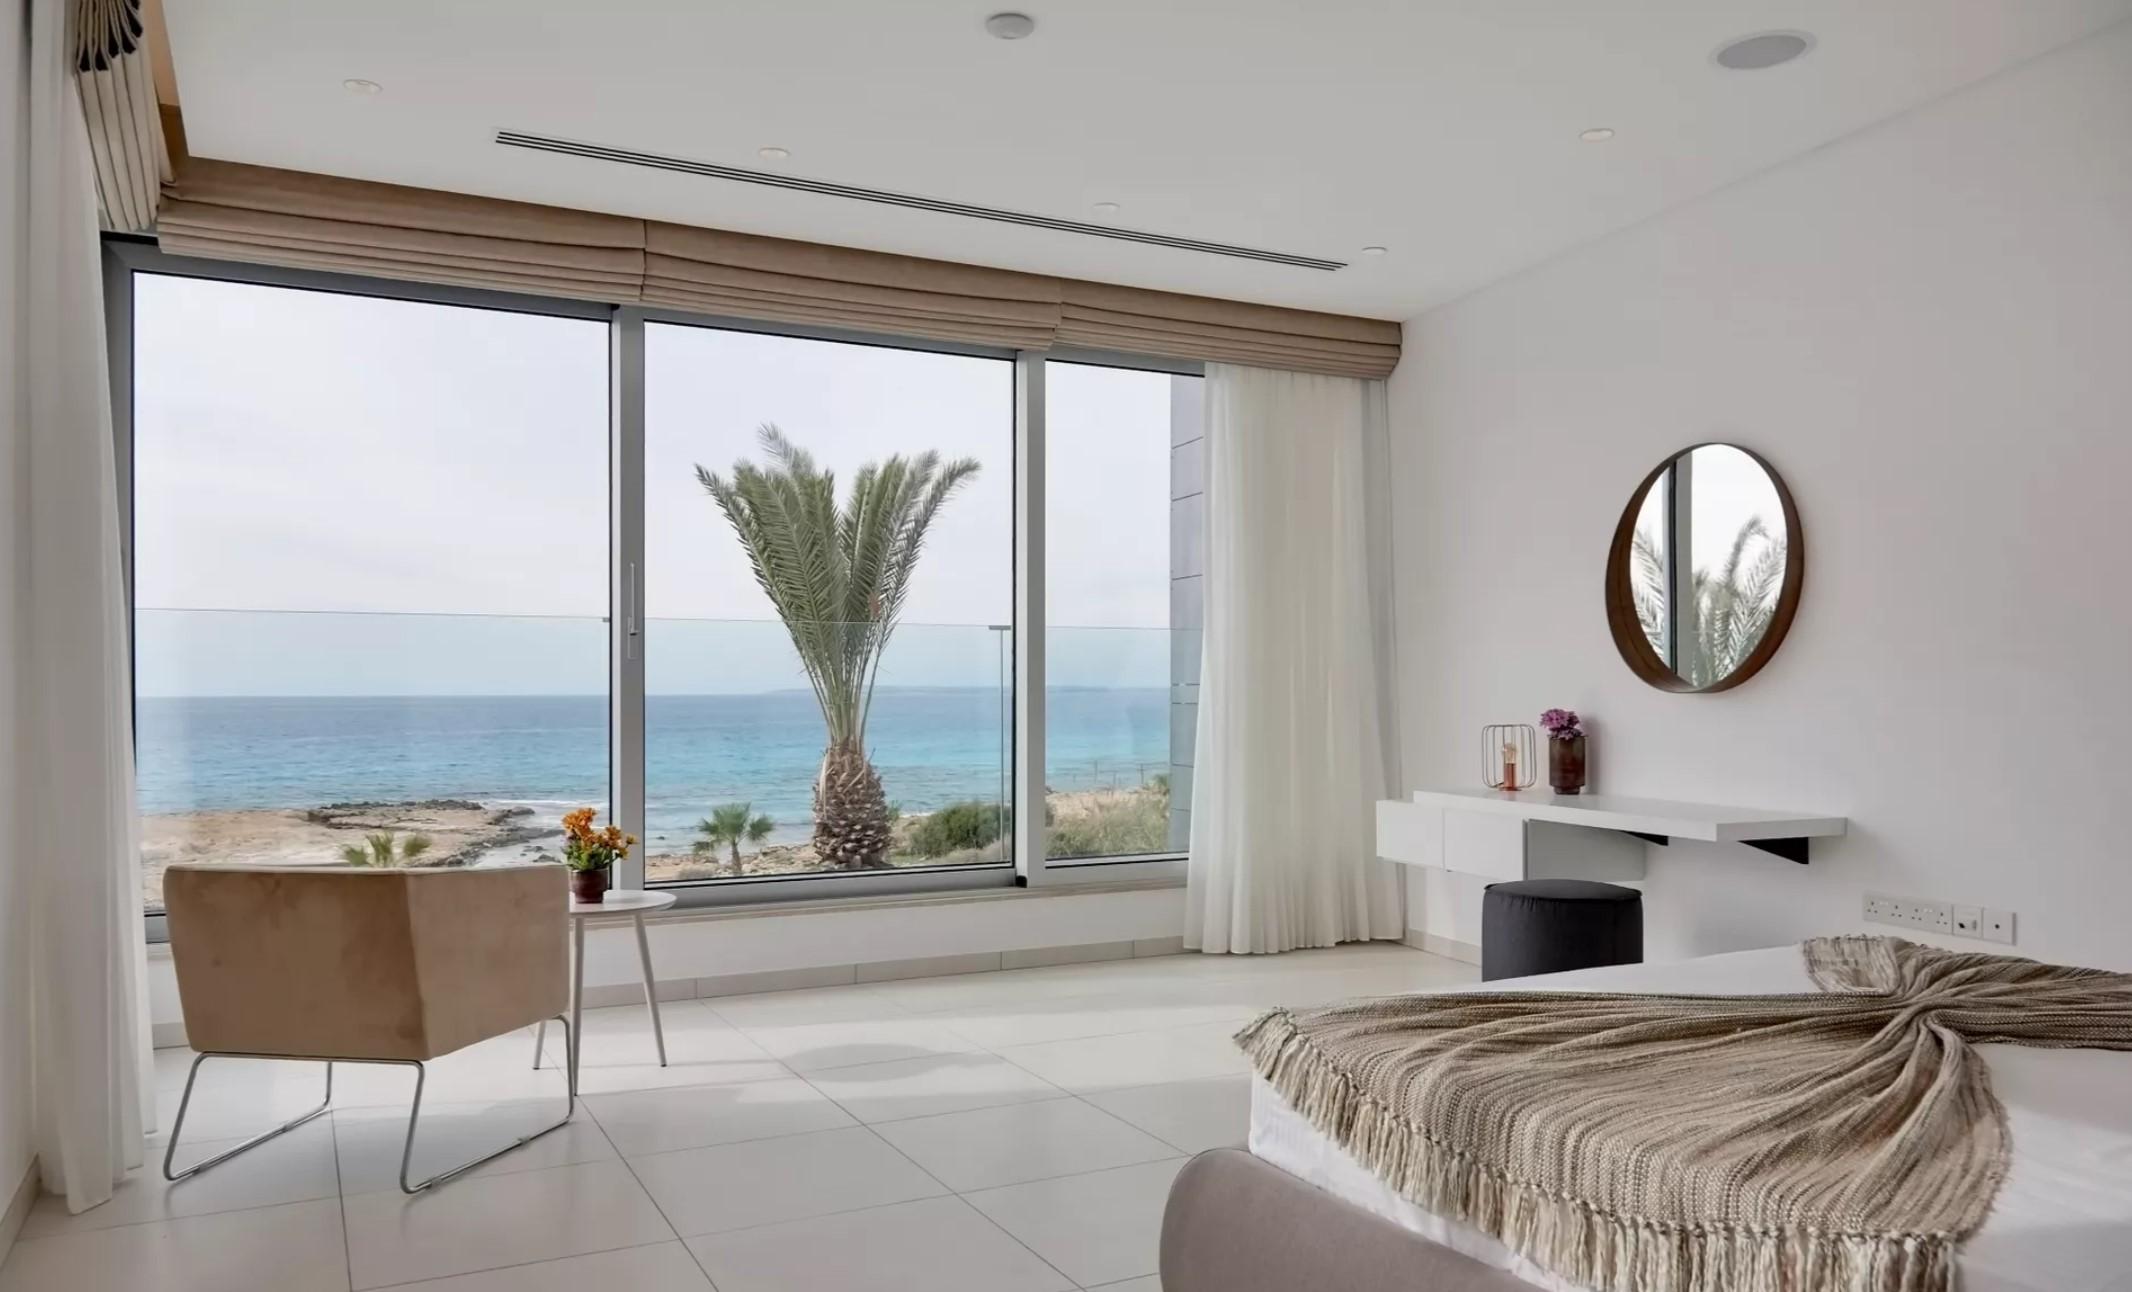 Luxury 6-bedroom beachfront villa in Ayia Napa